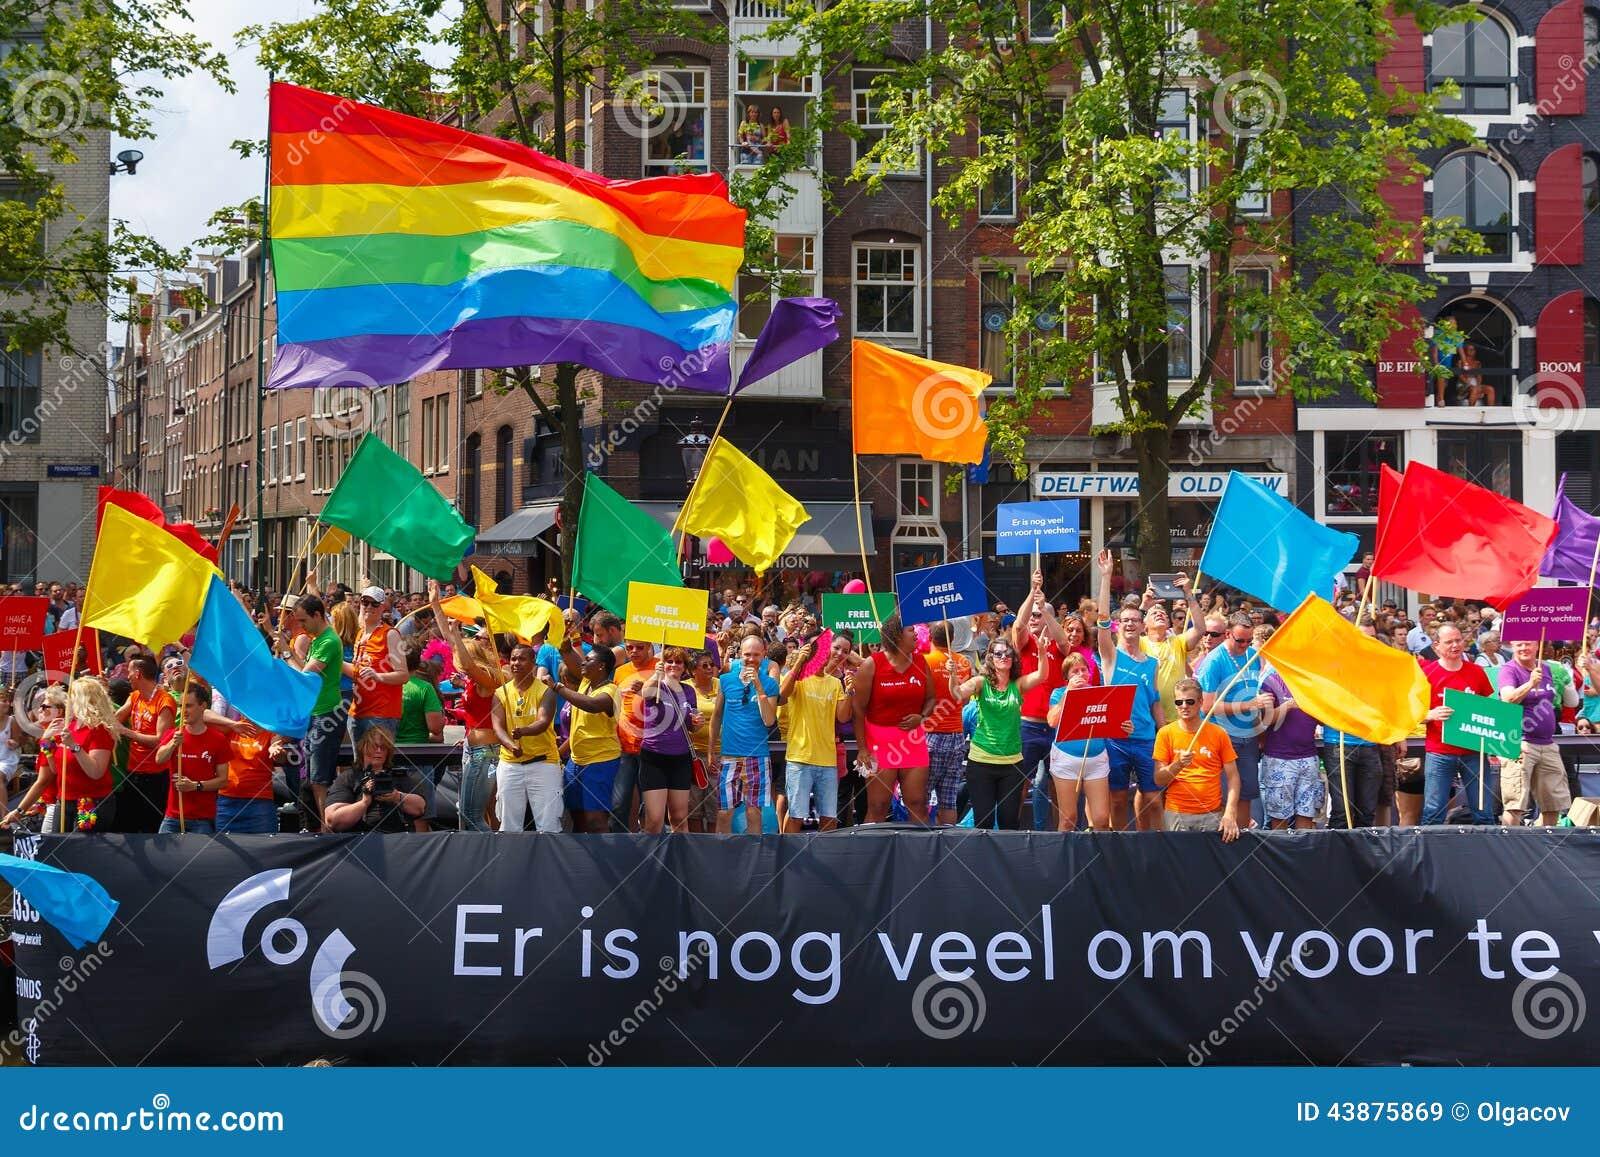 gay coc group sex lesbians